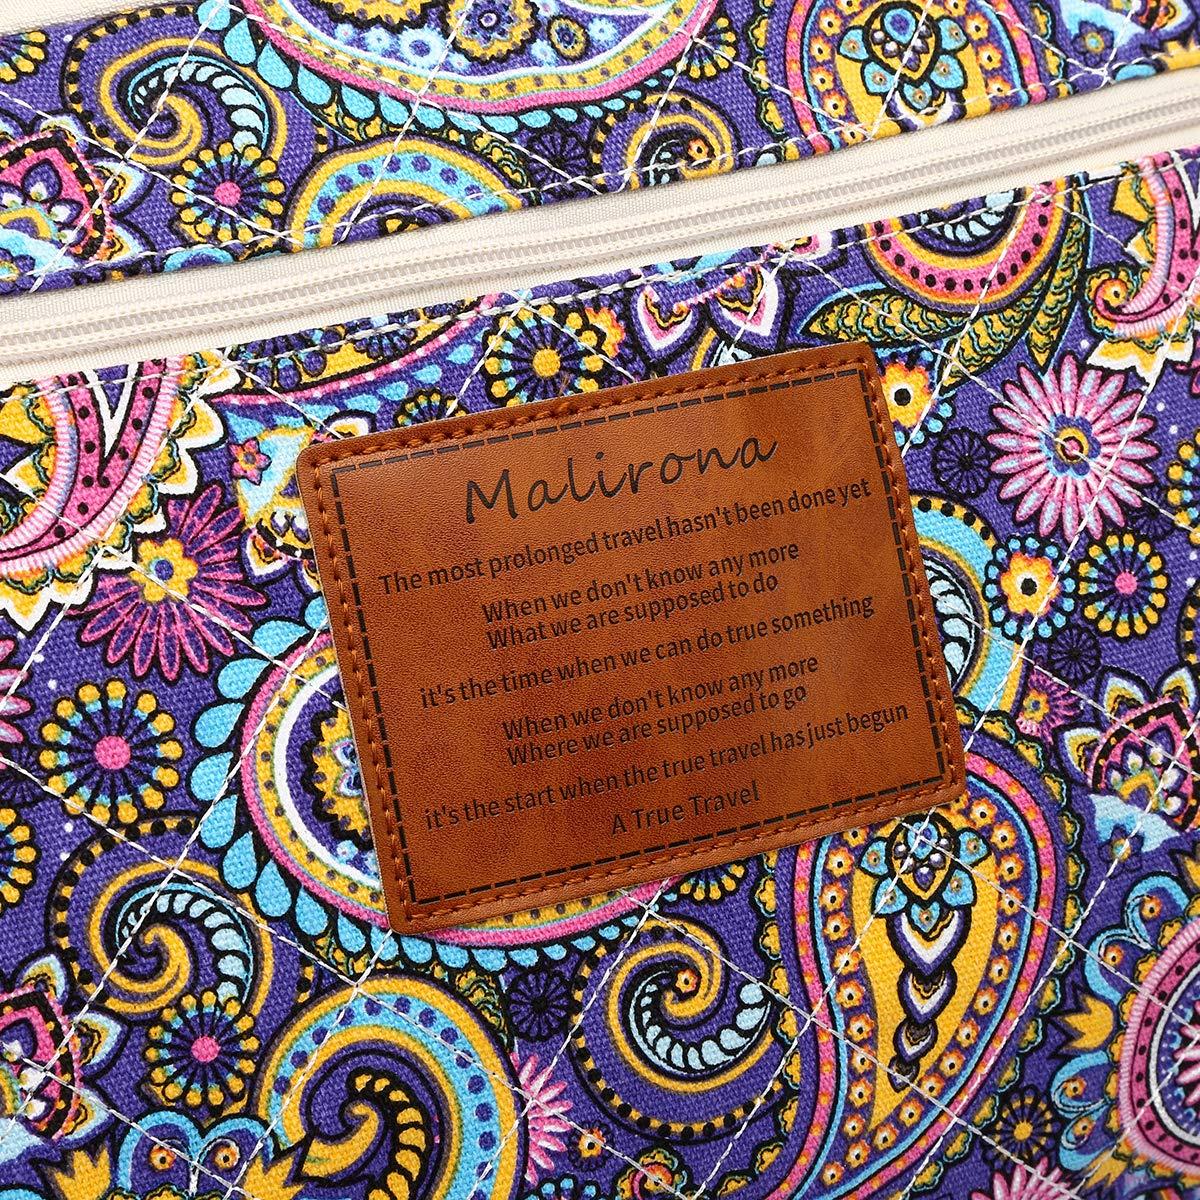 Malirona Women's Canvas Overnight Weekender Bag Carry On Travel Duffel Tote Bag Bohemian Flower (Purple Flower) by Malirona (Image #7)